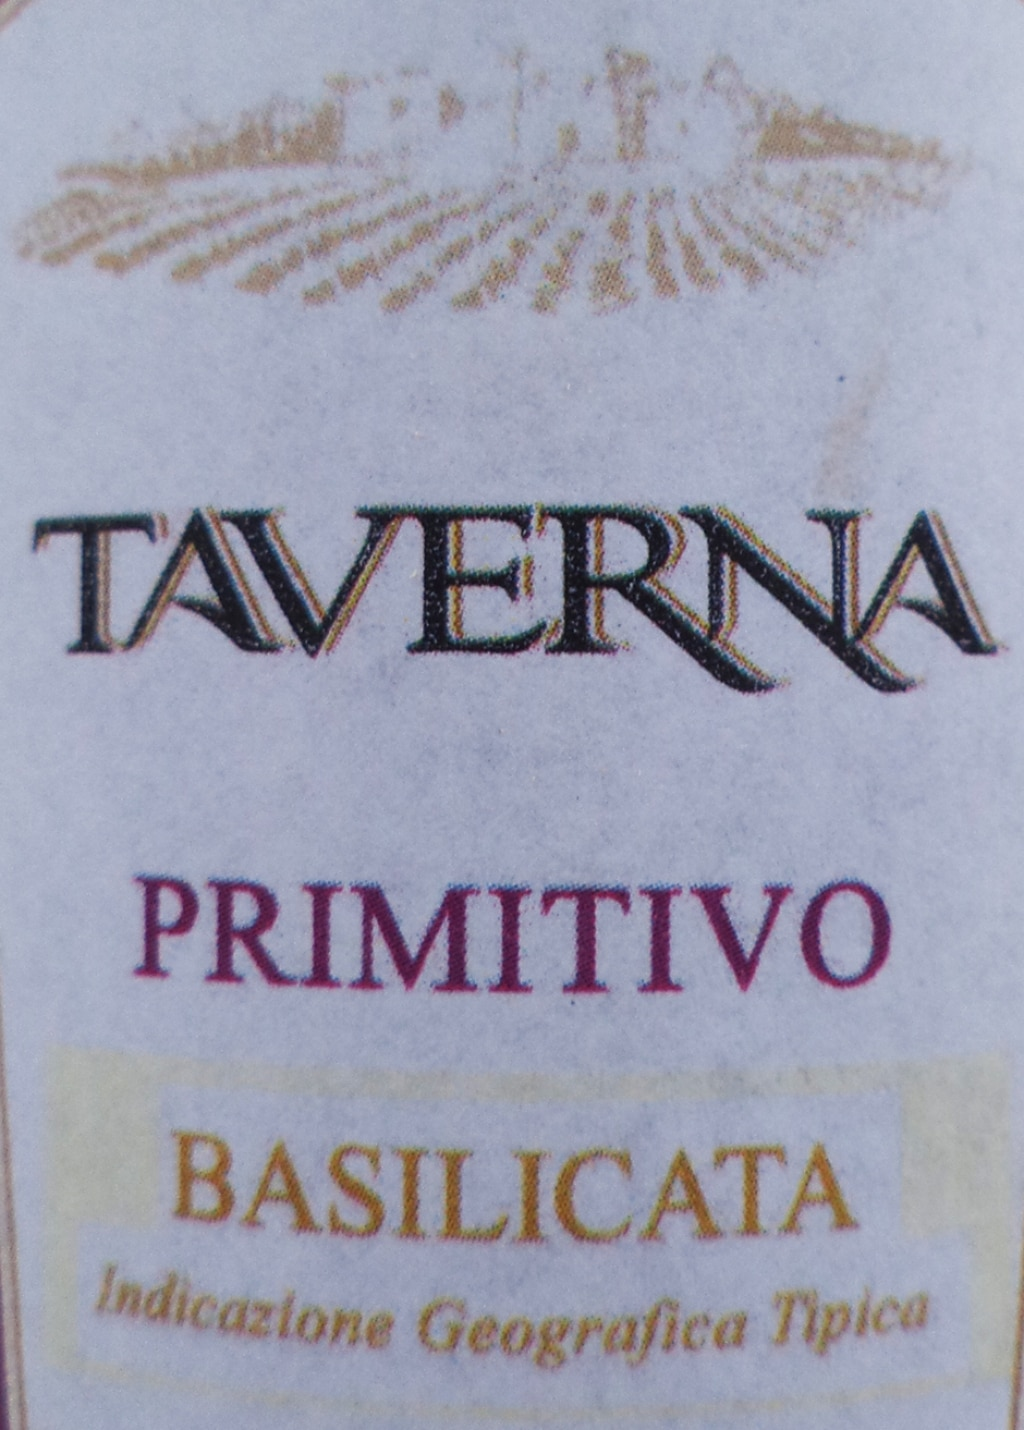 IGT Basilicata Primitivo - Taverna 2012